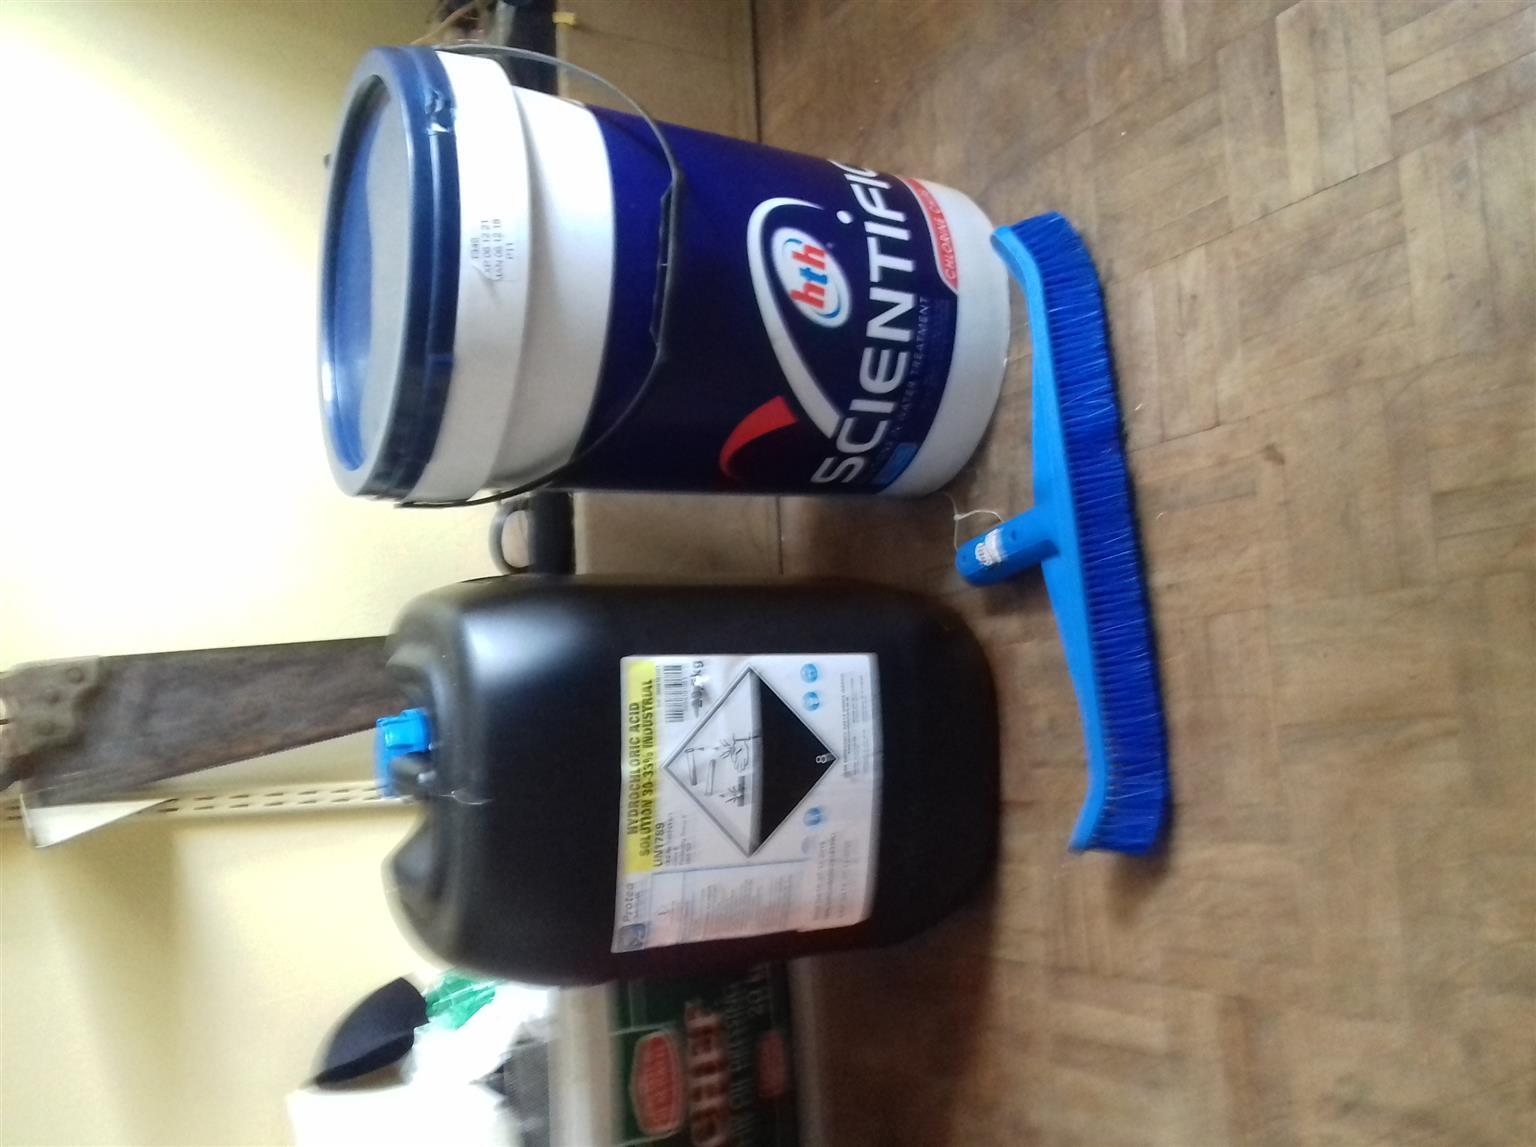 HTH and Hydrochloric acid